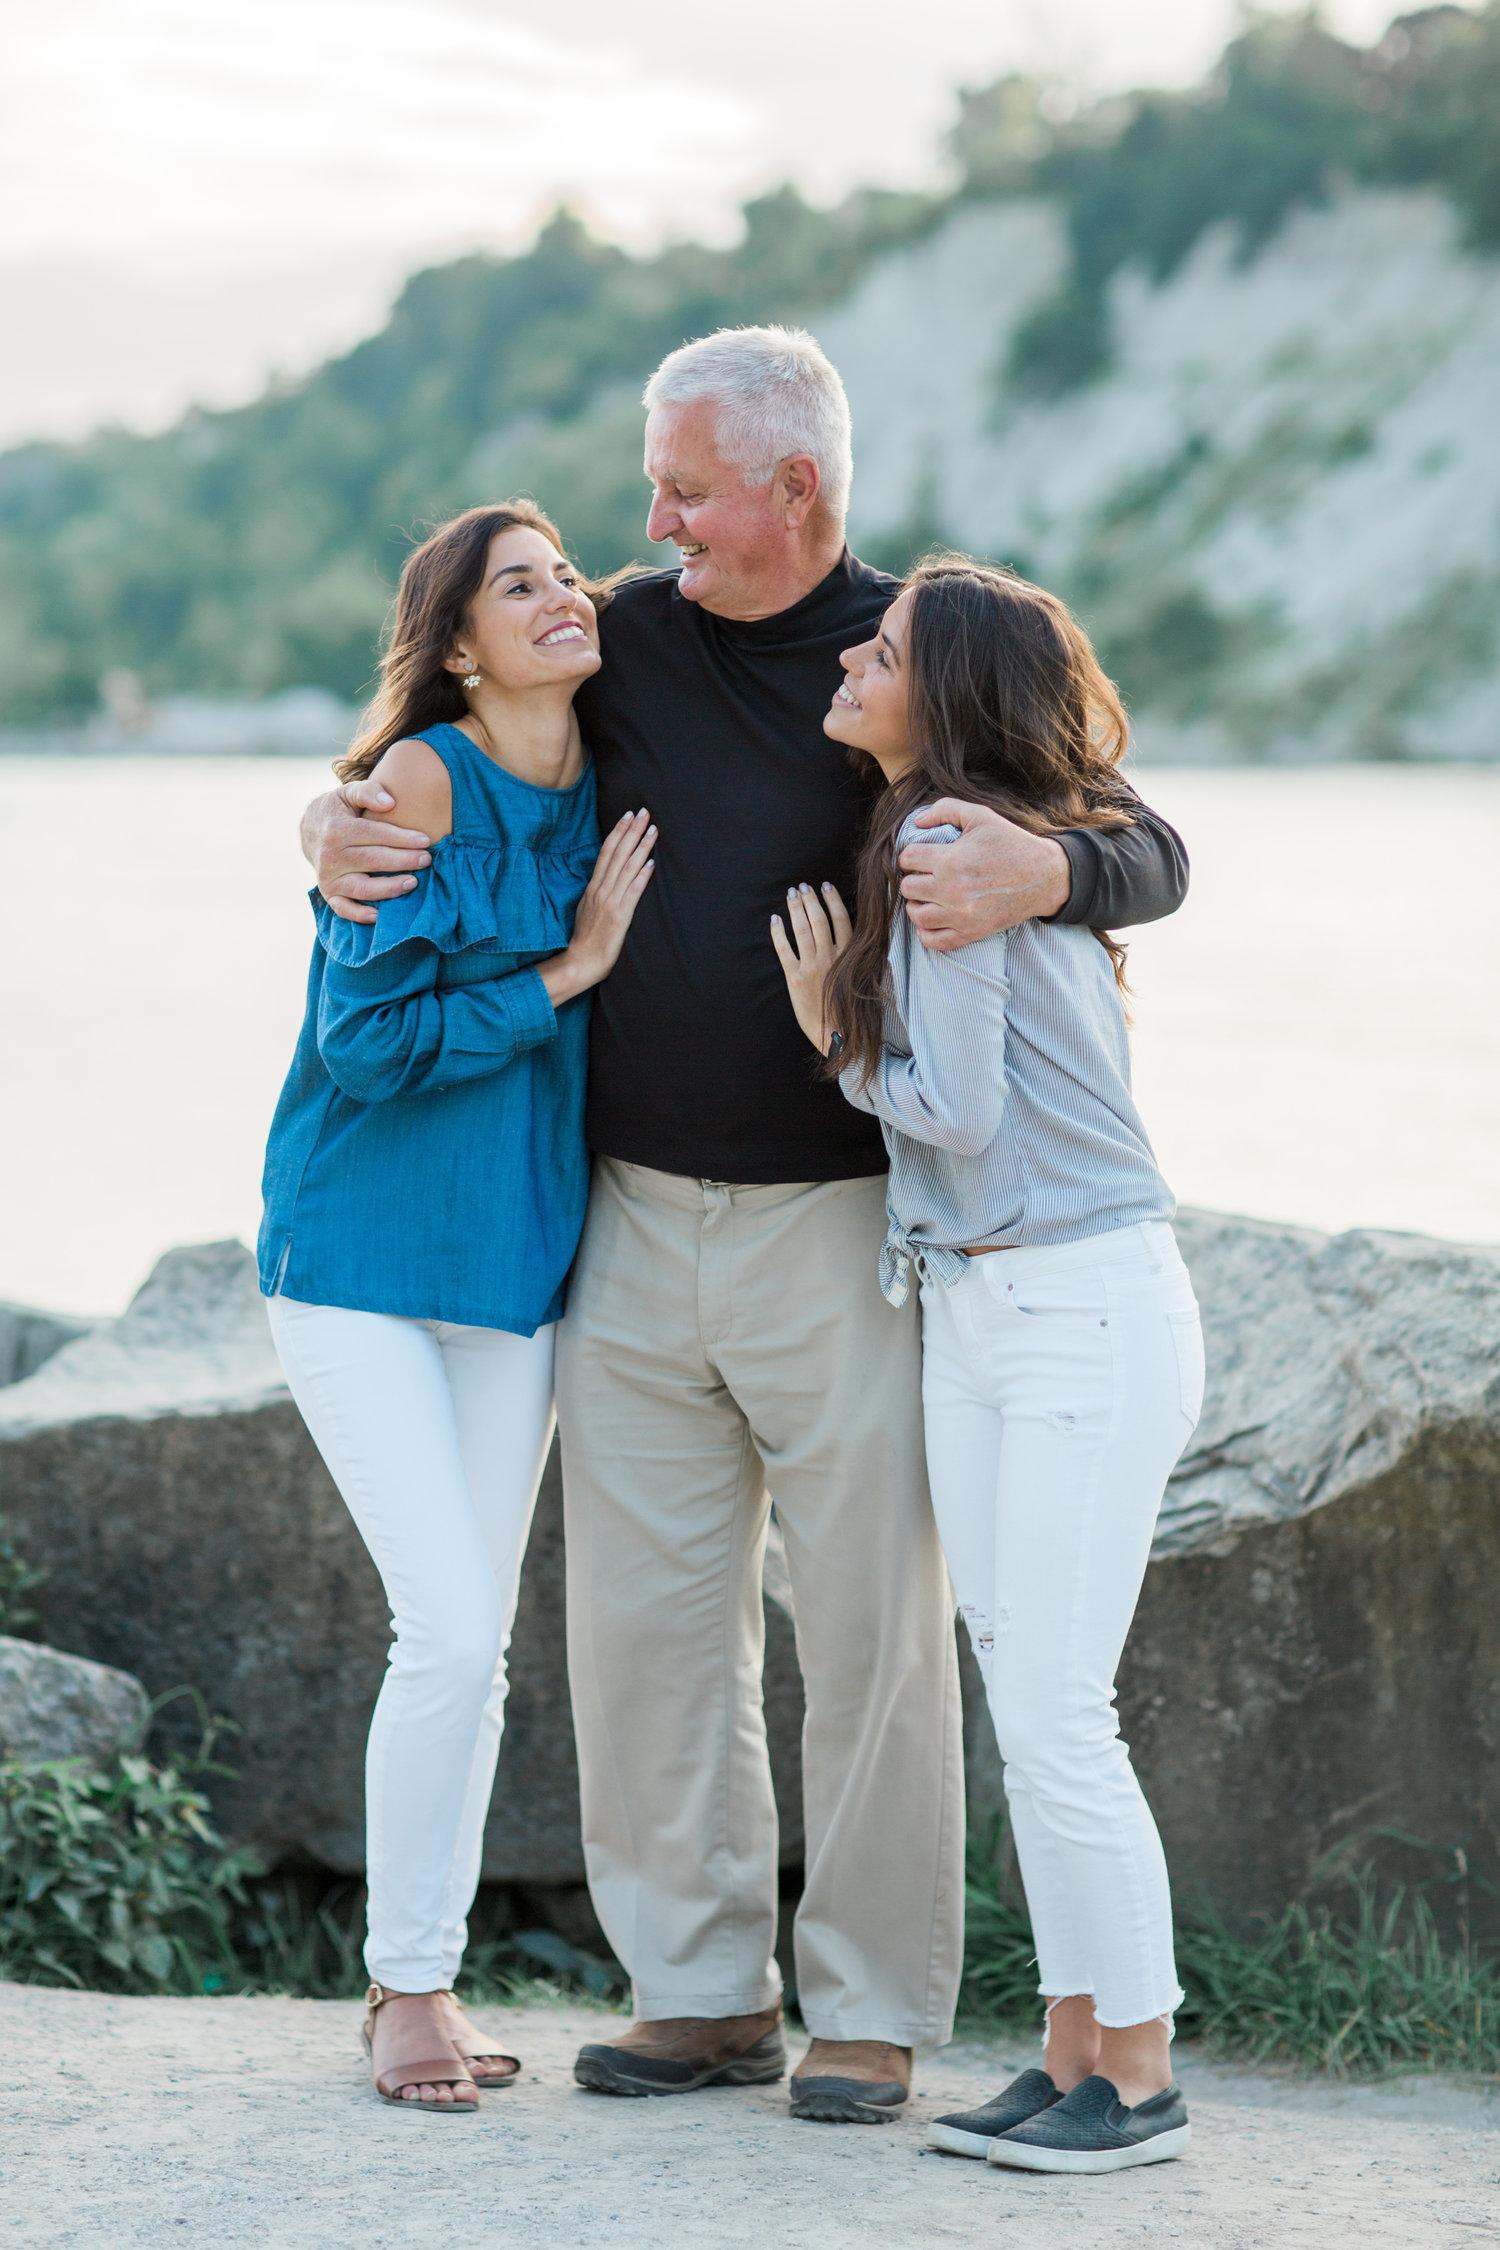 Danielle-Giroux-Amir-Golbazi-Genua-Family-Photography-Scarborough-Bluffs-0269.jpg